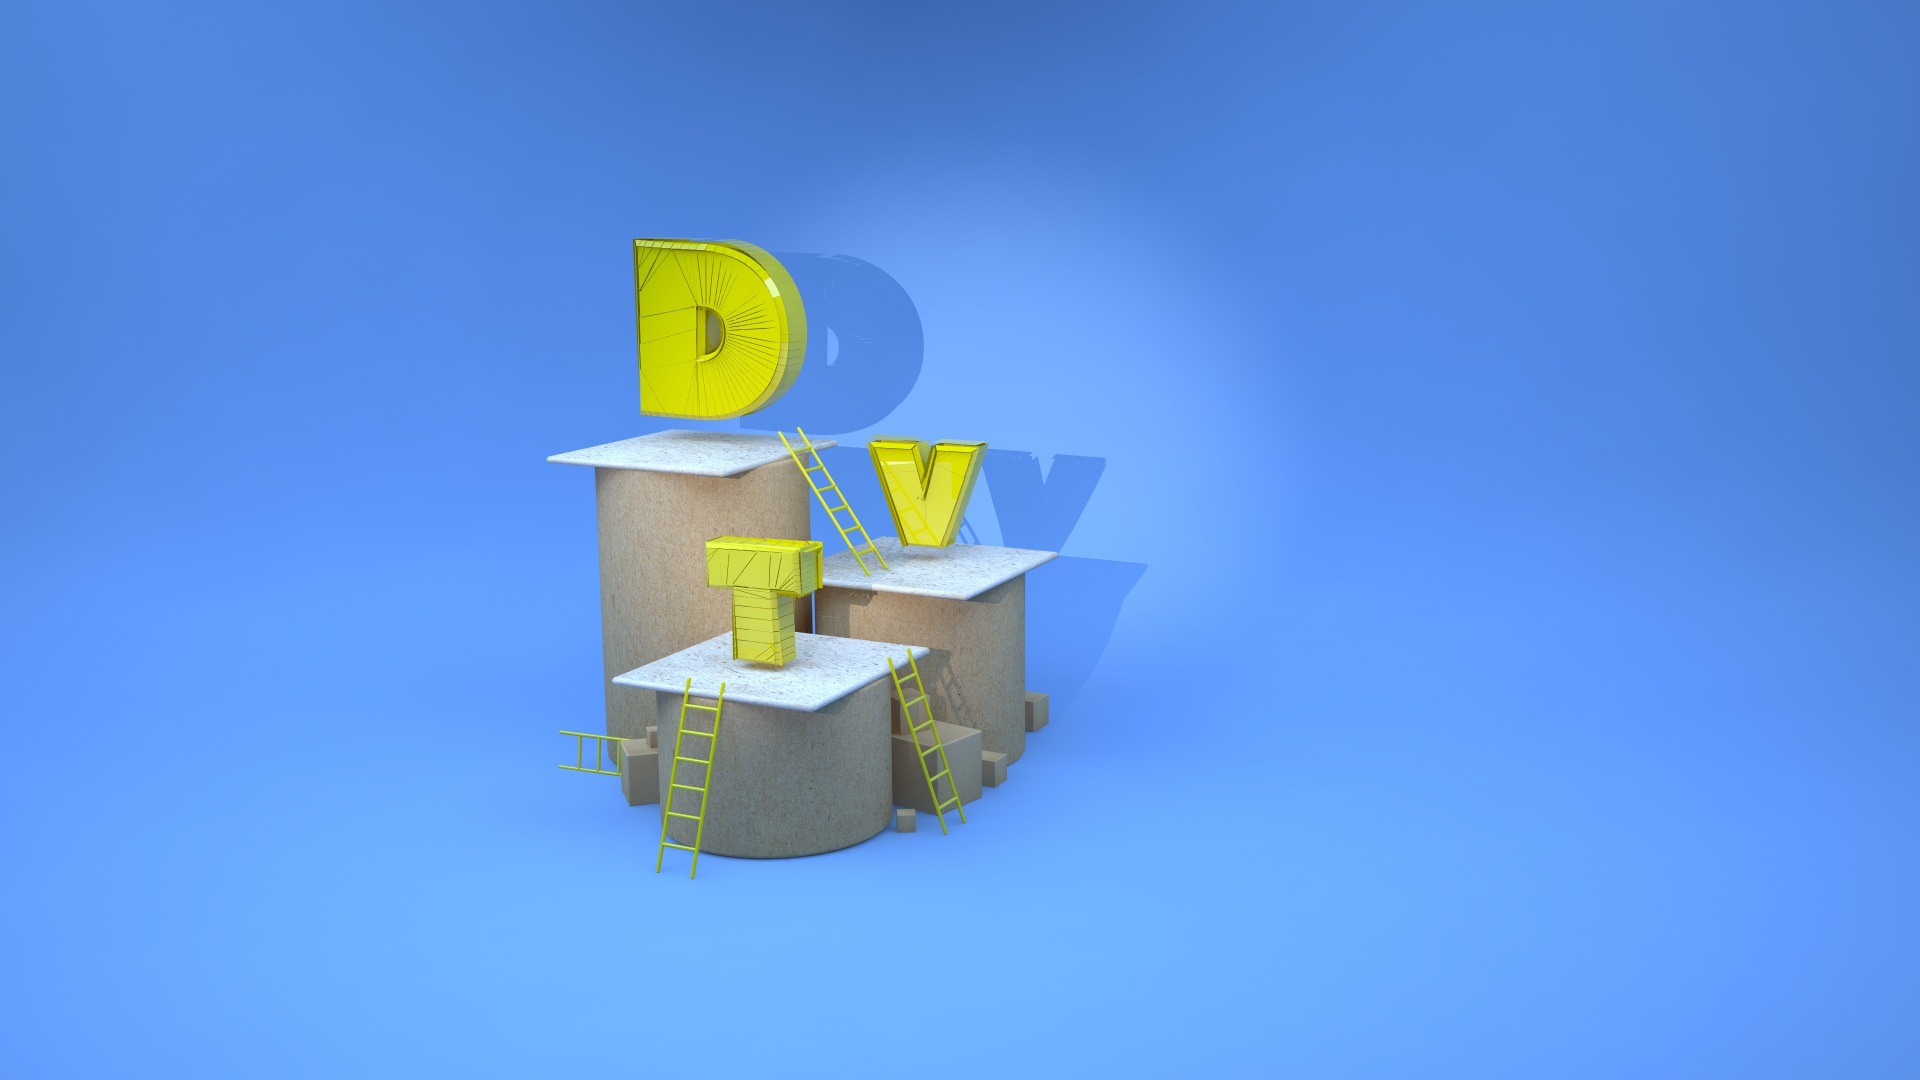 divert_textanimation_001_0078.jpg